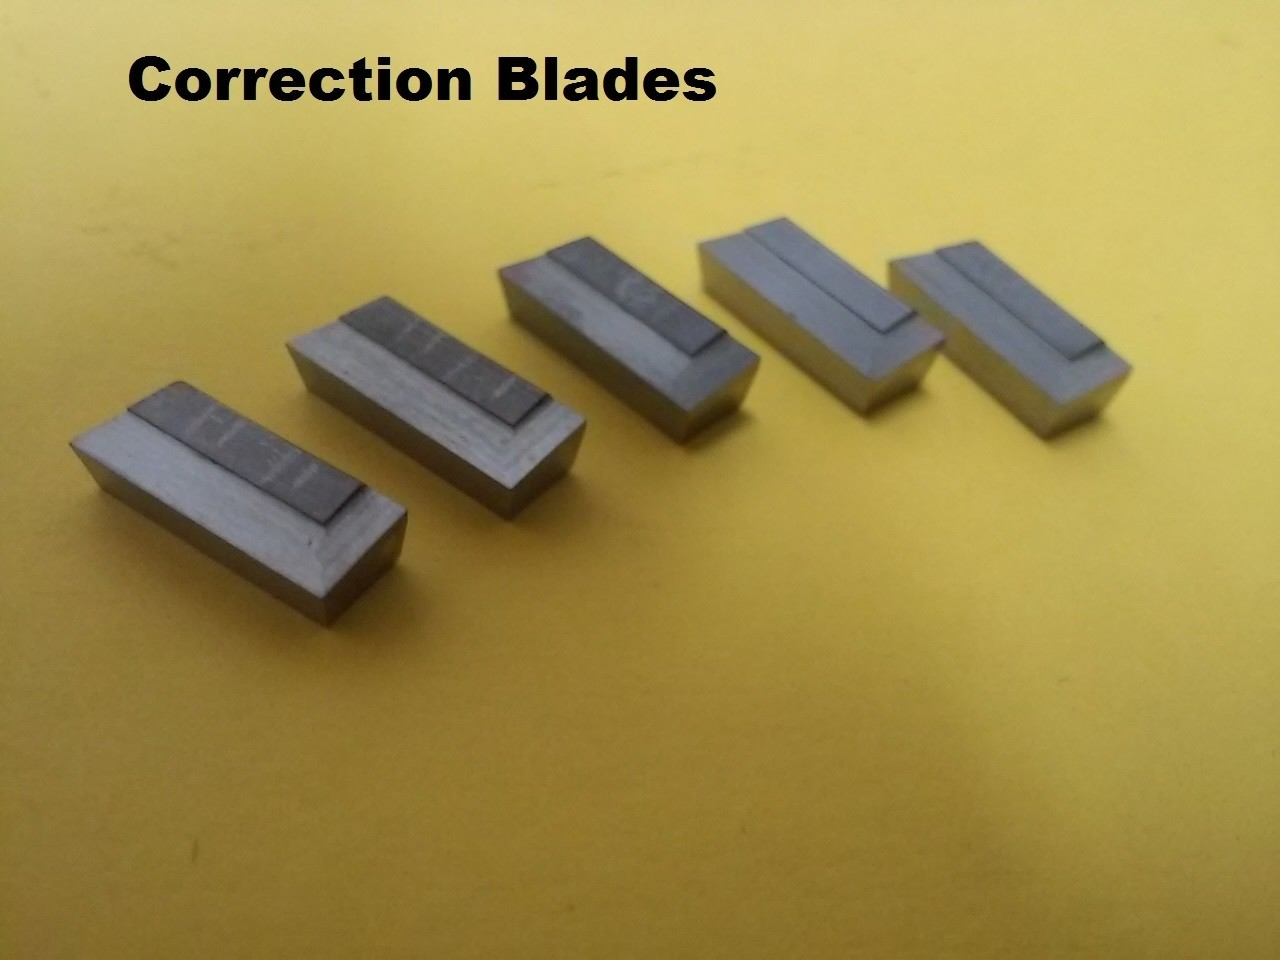 Correction blades, flat set of 5 blades